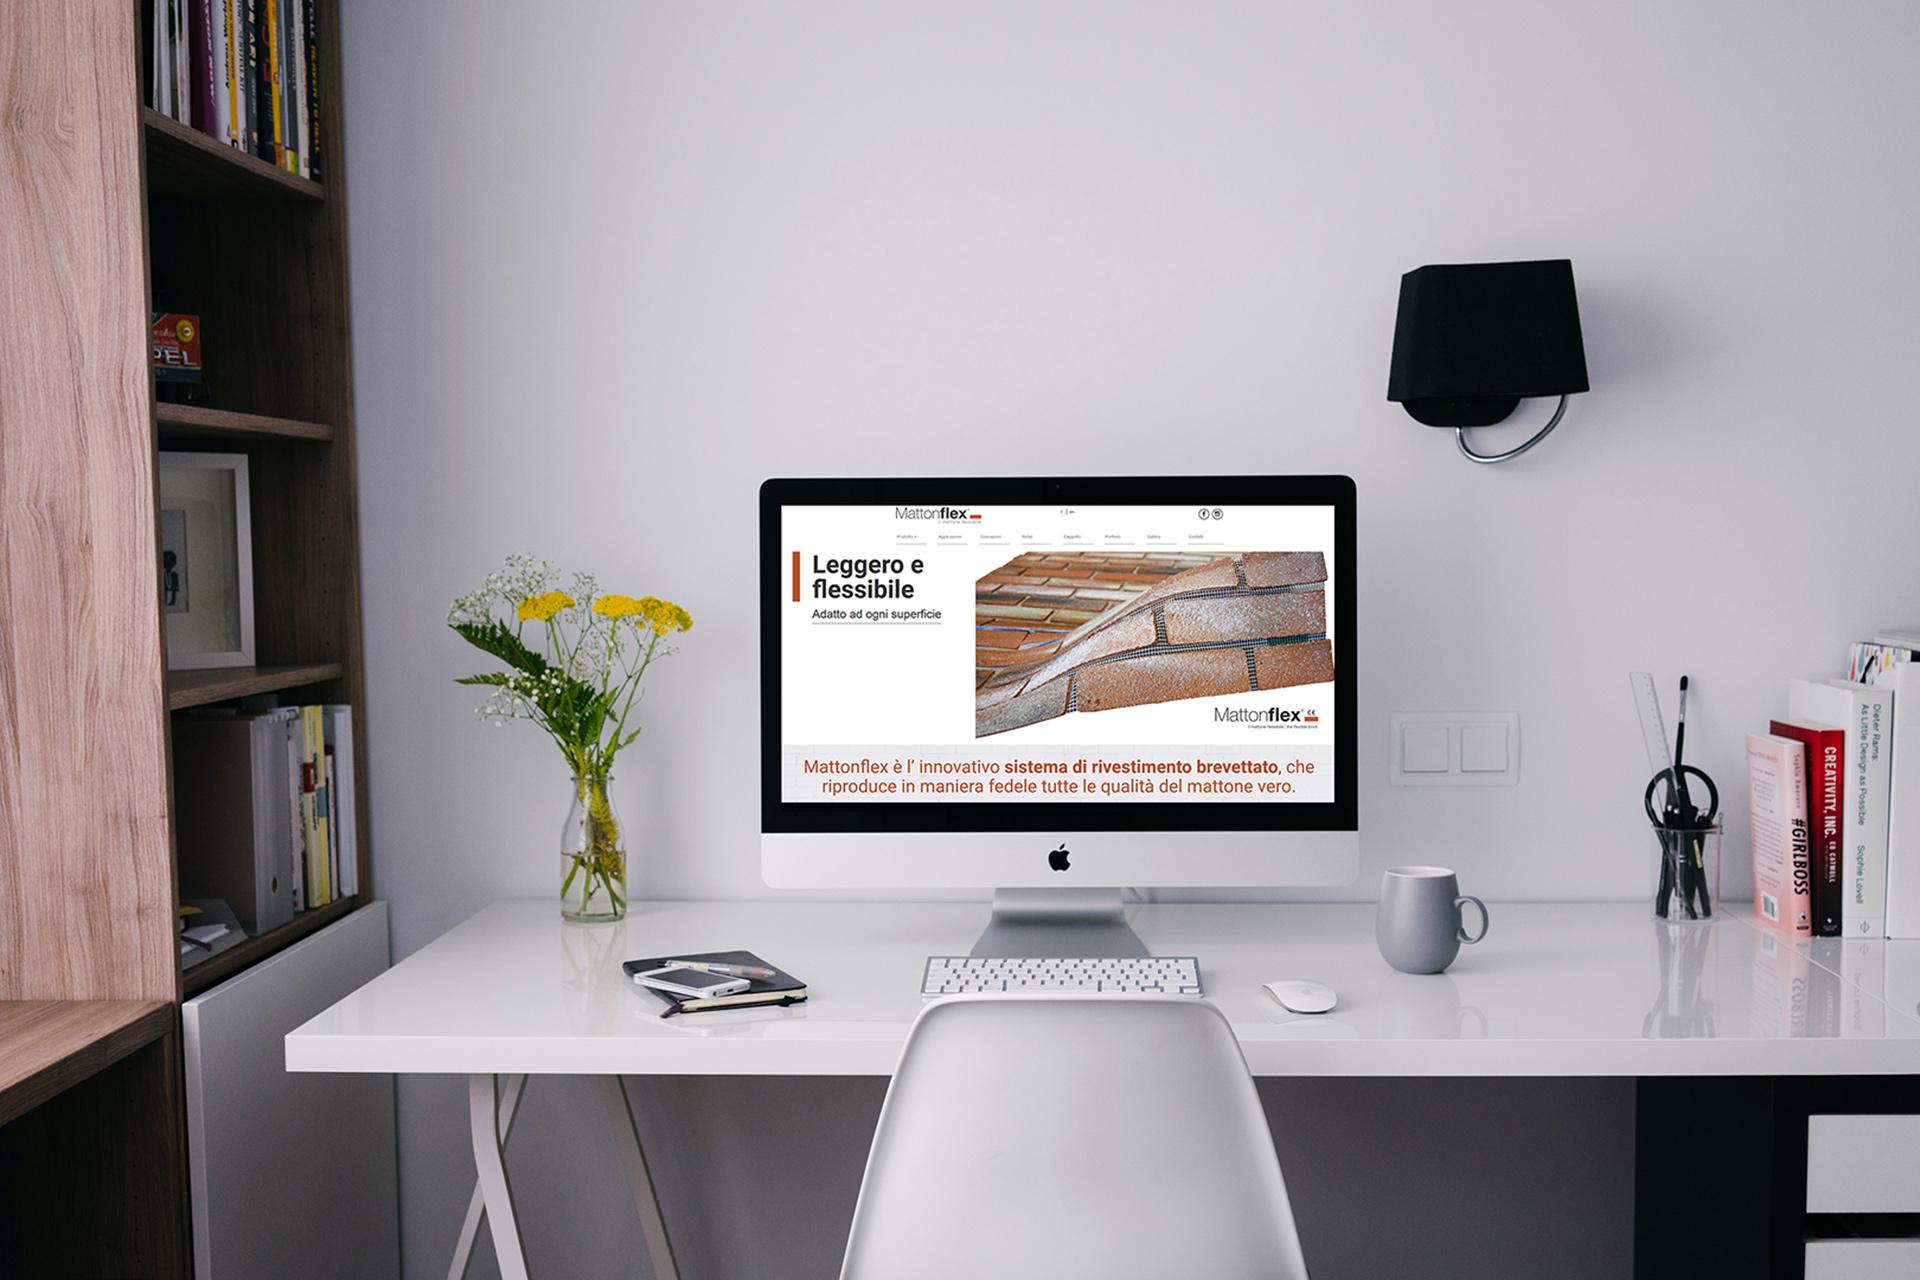 mattonflex il mattone flessibile desktop